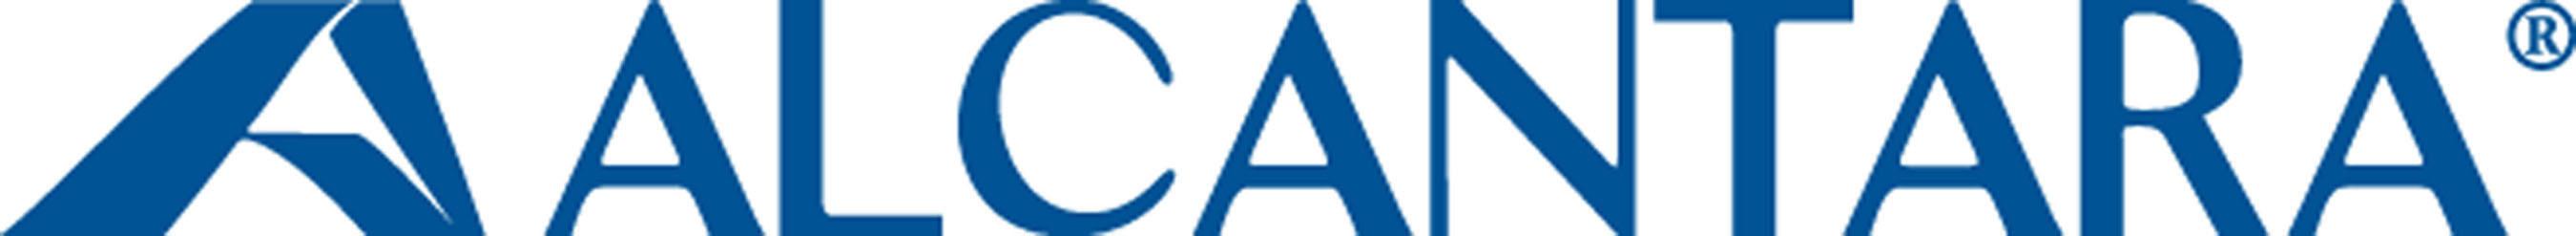 Alcantara Logo. (PRNewsFoto/Alcantara) (PRNewsFoto/Alcantara)